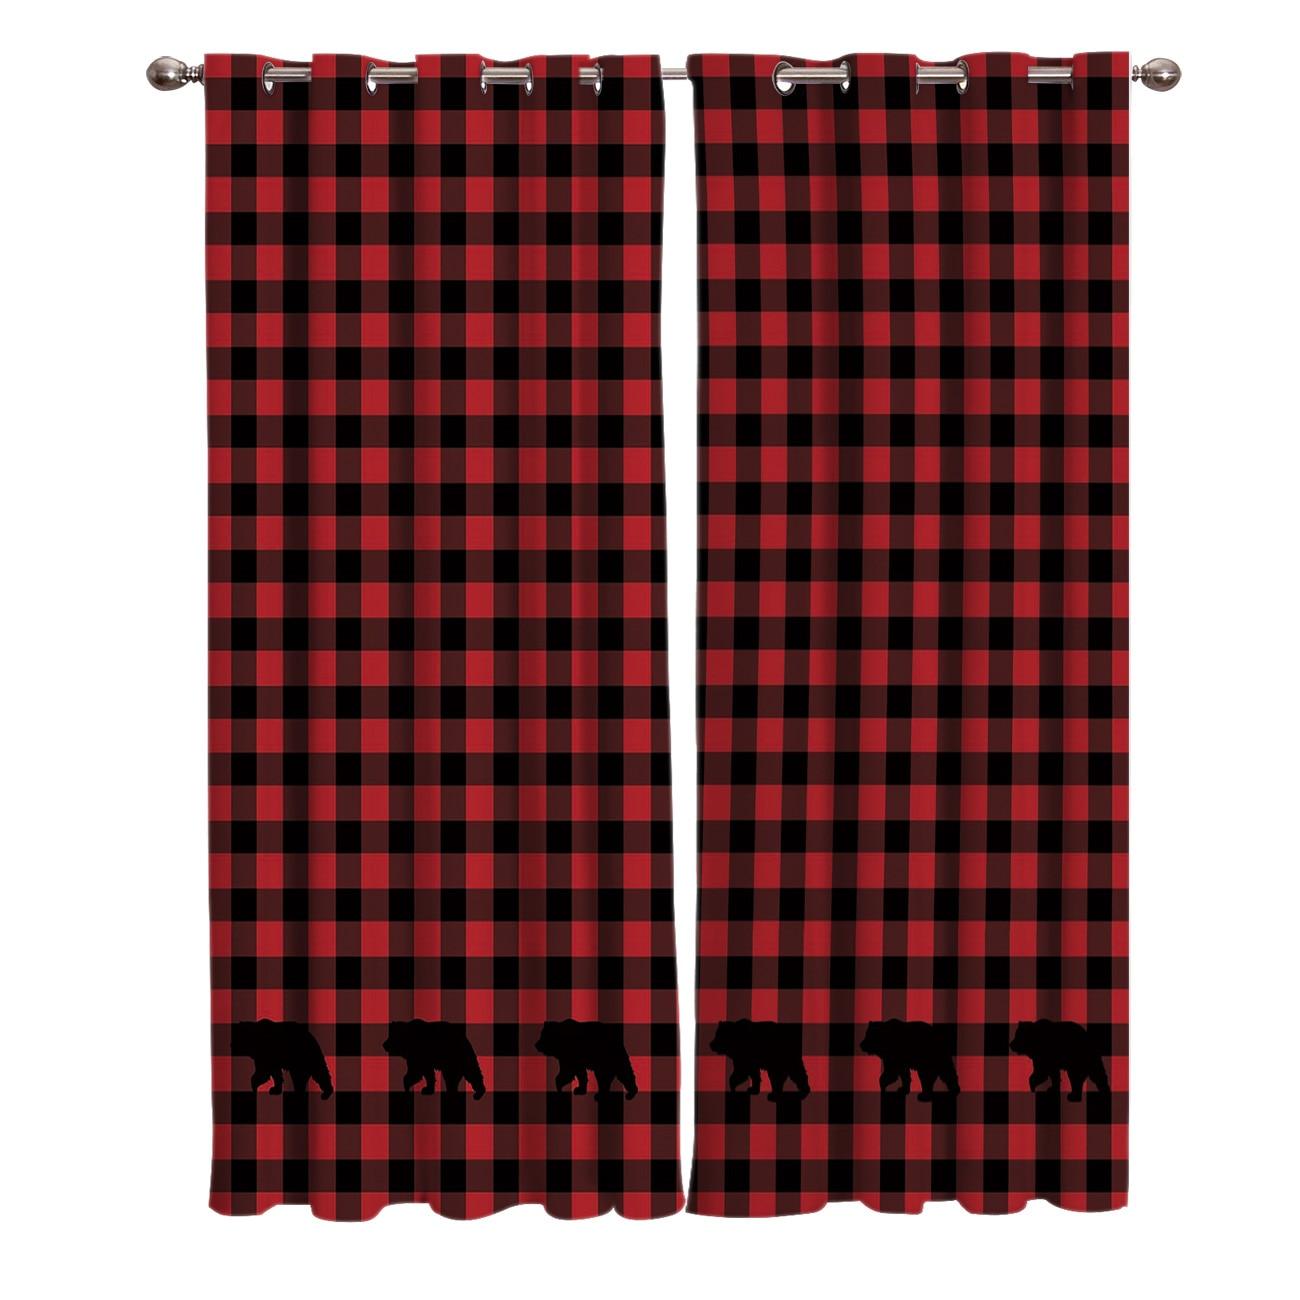 red black plaid bear window curtains curtain rod living room bathroom decor print window treatment ideas window draperies party